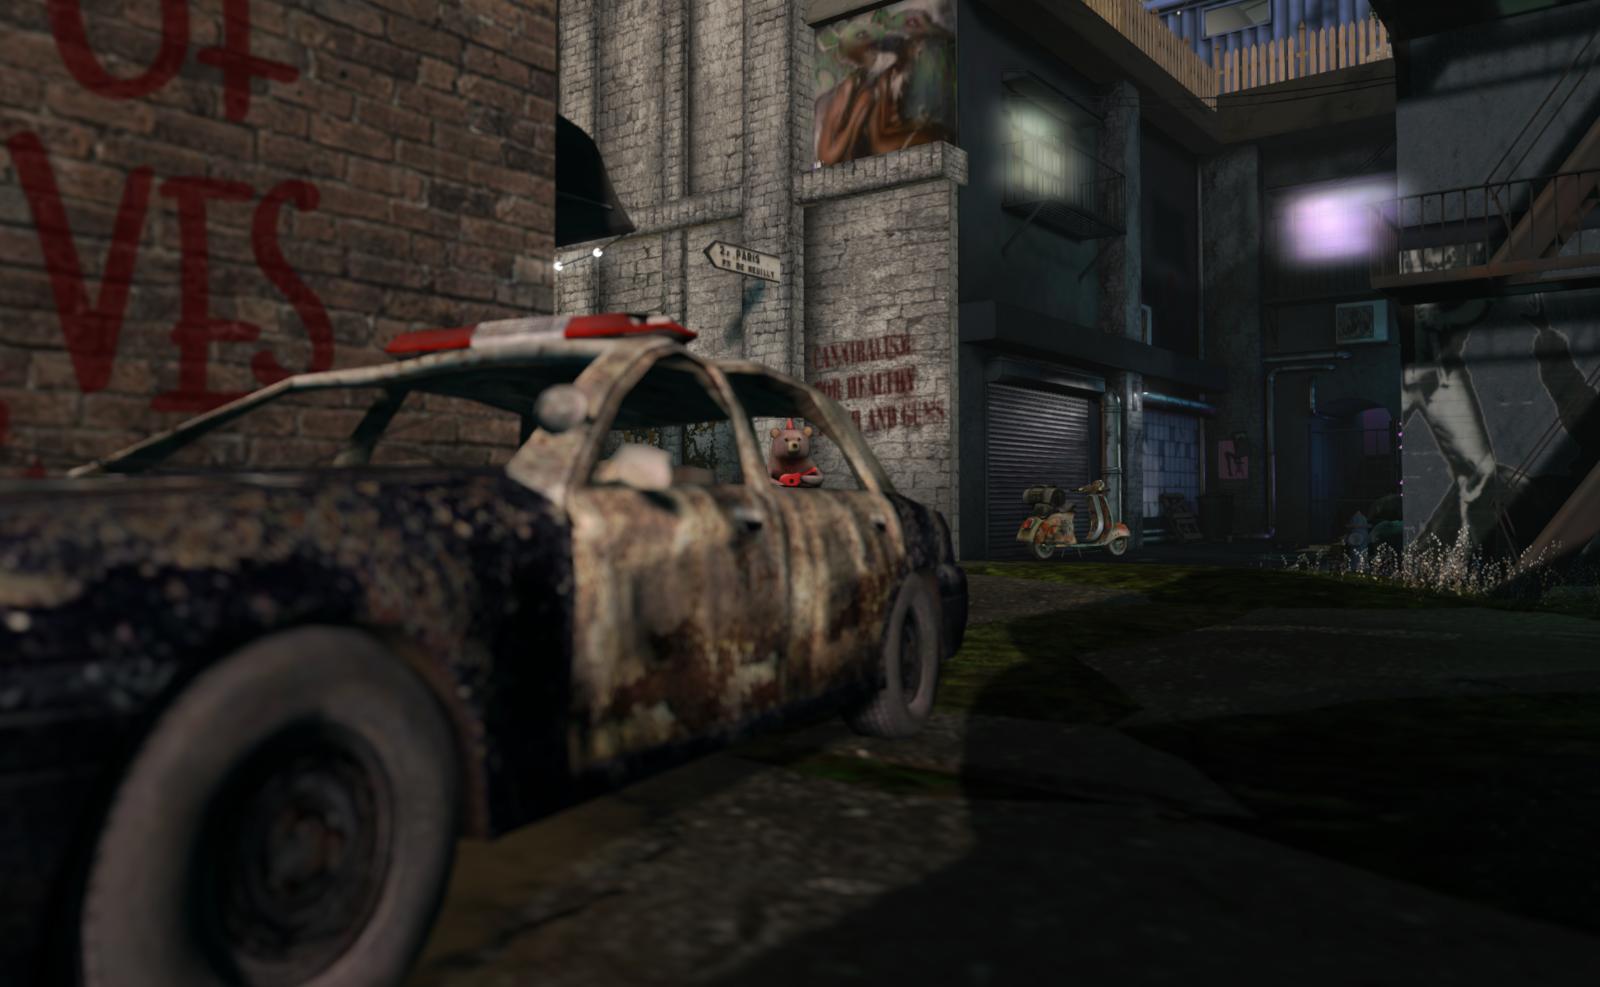 Post-apocalyptic urban scene in Dystopia